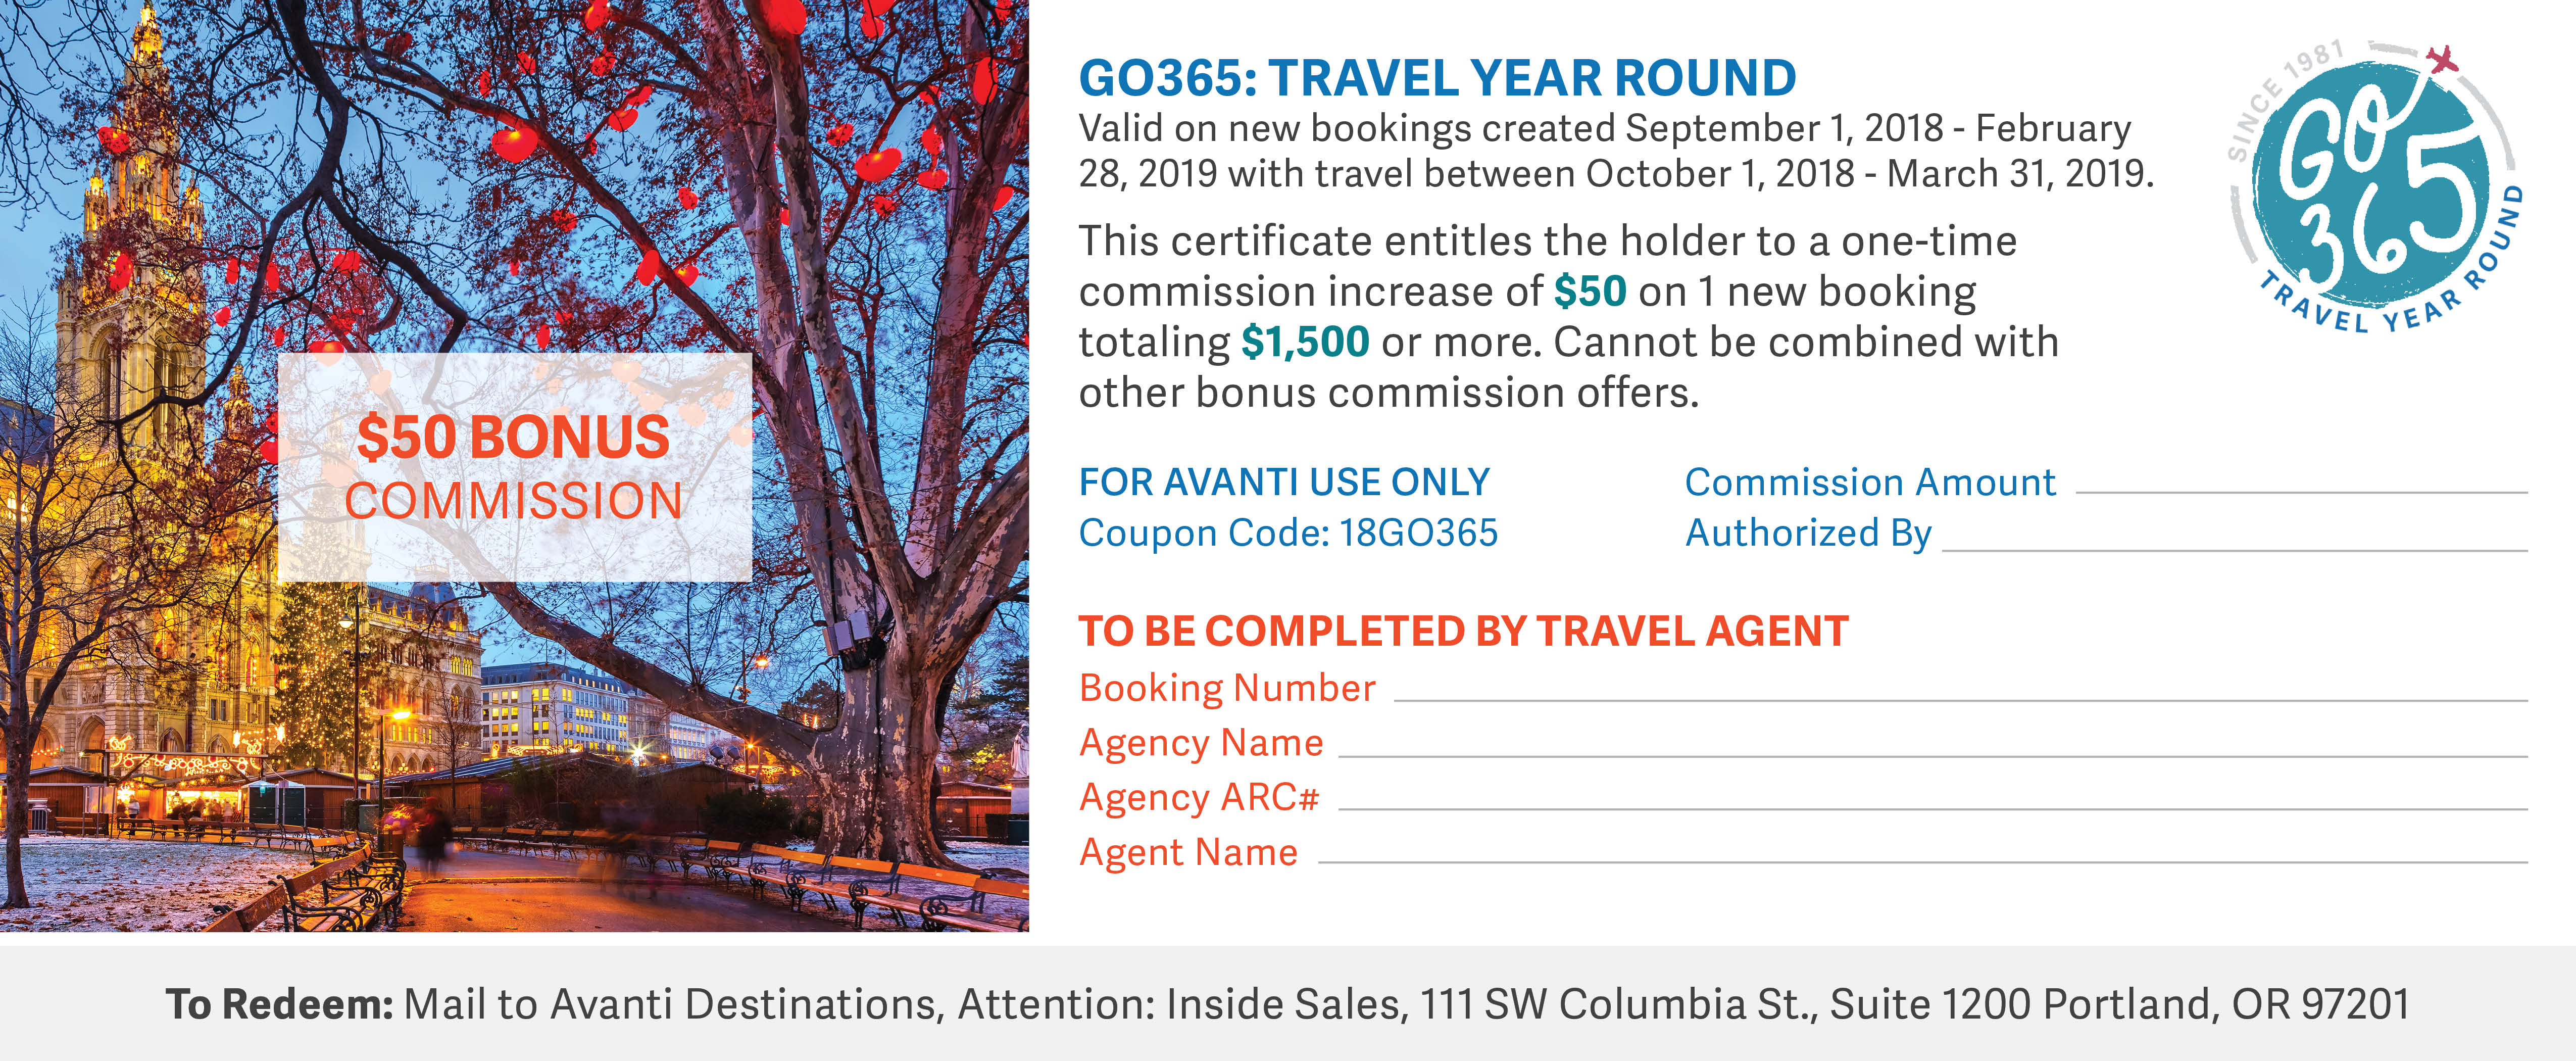 Go 365: Celebrating Year Round Travel